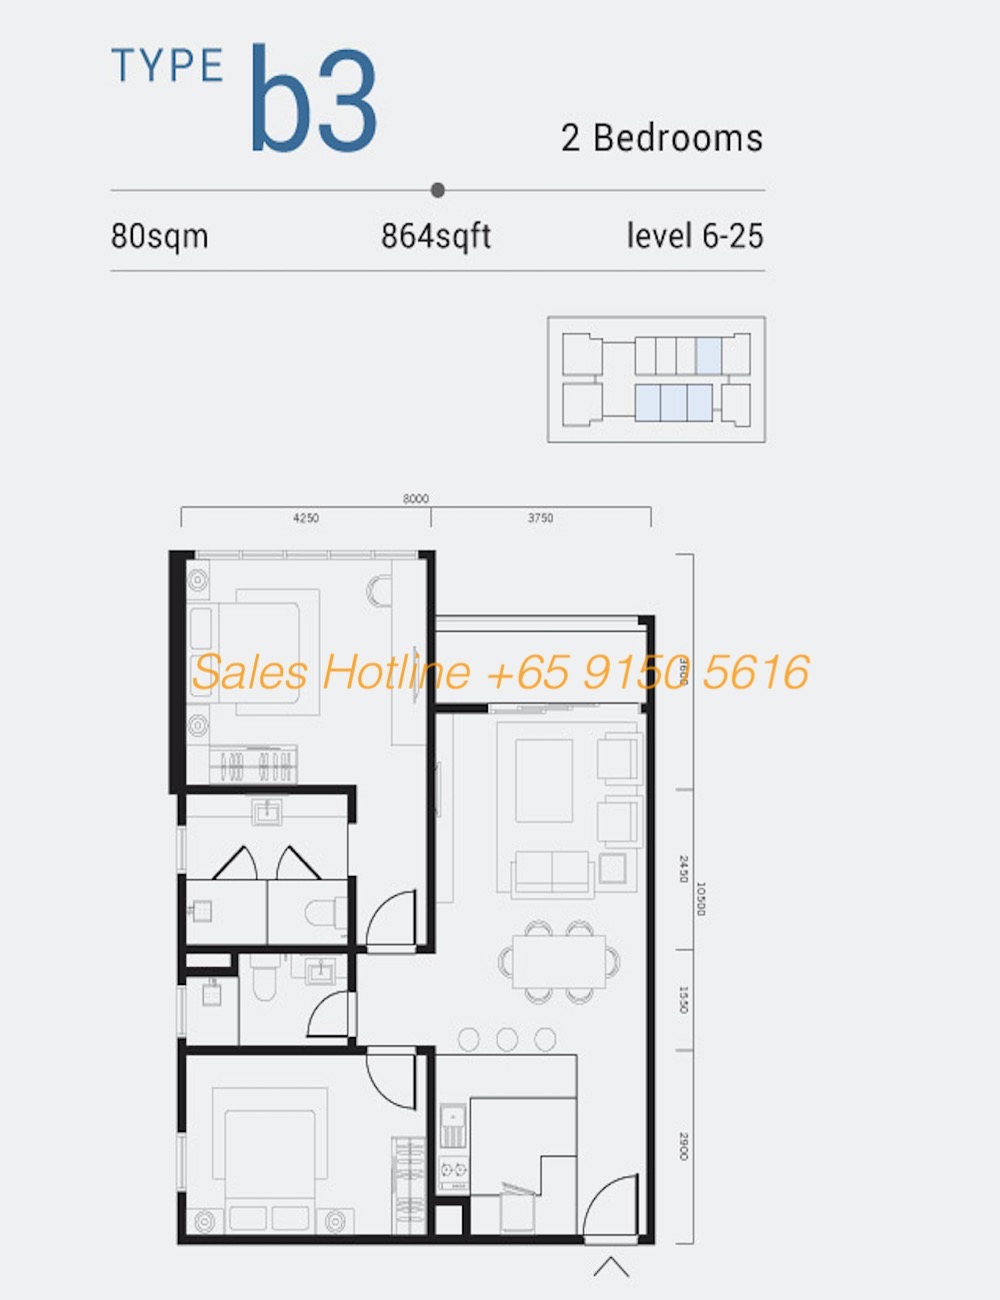 Shama Medini - 2 Bedroom Type B3